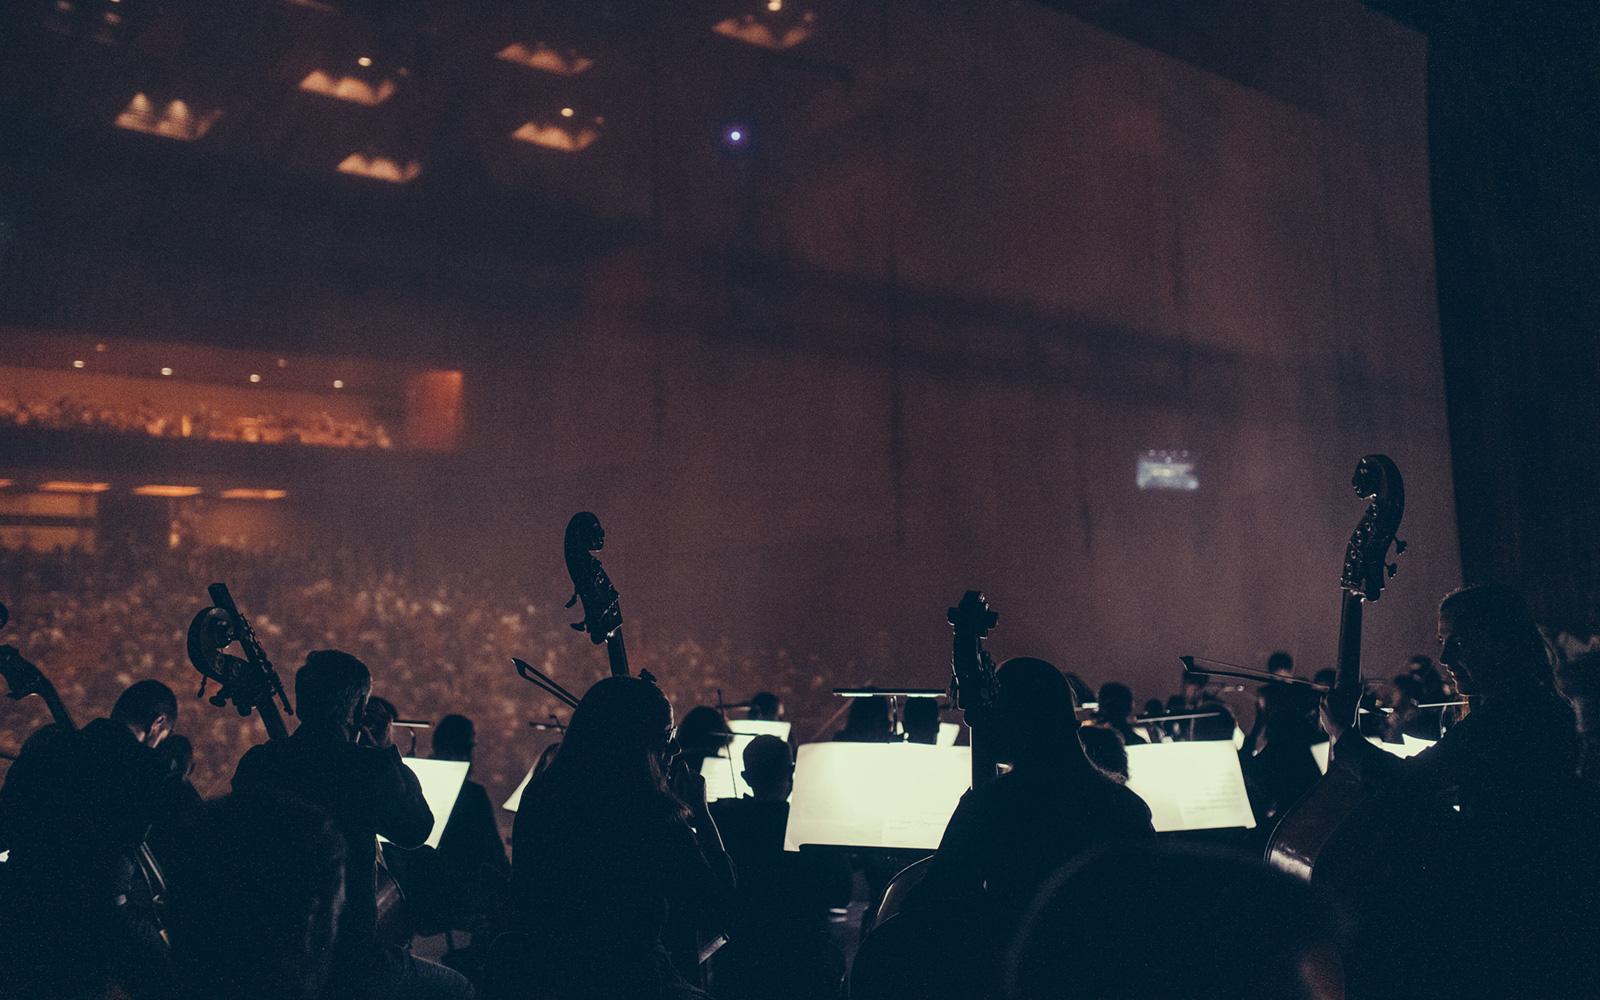 A Música continua © Pedro Pina